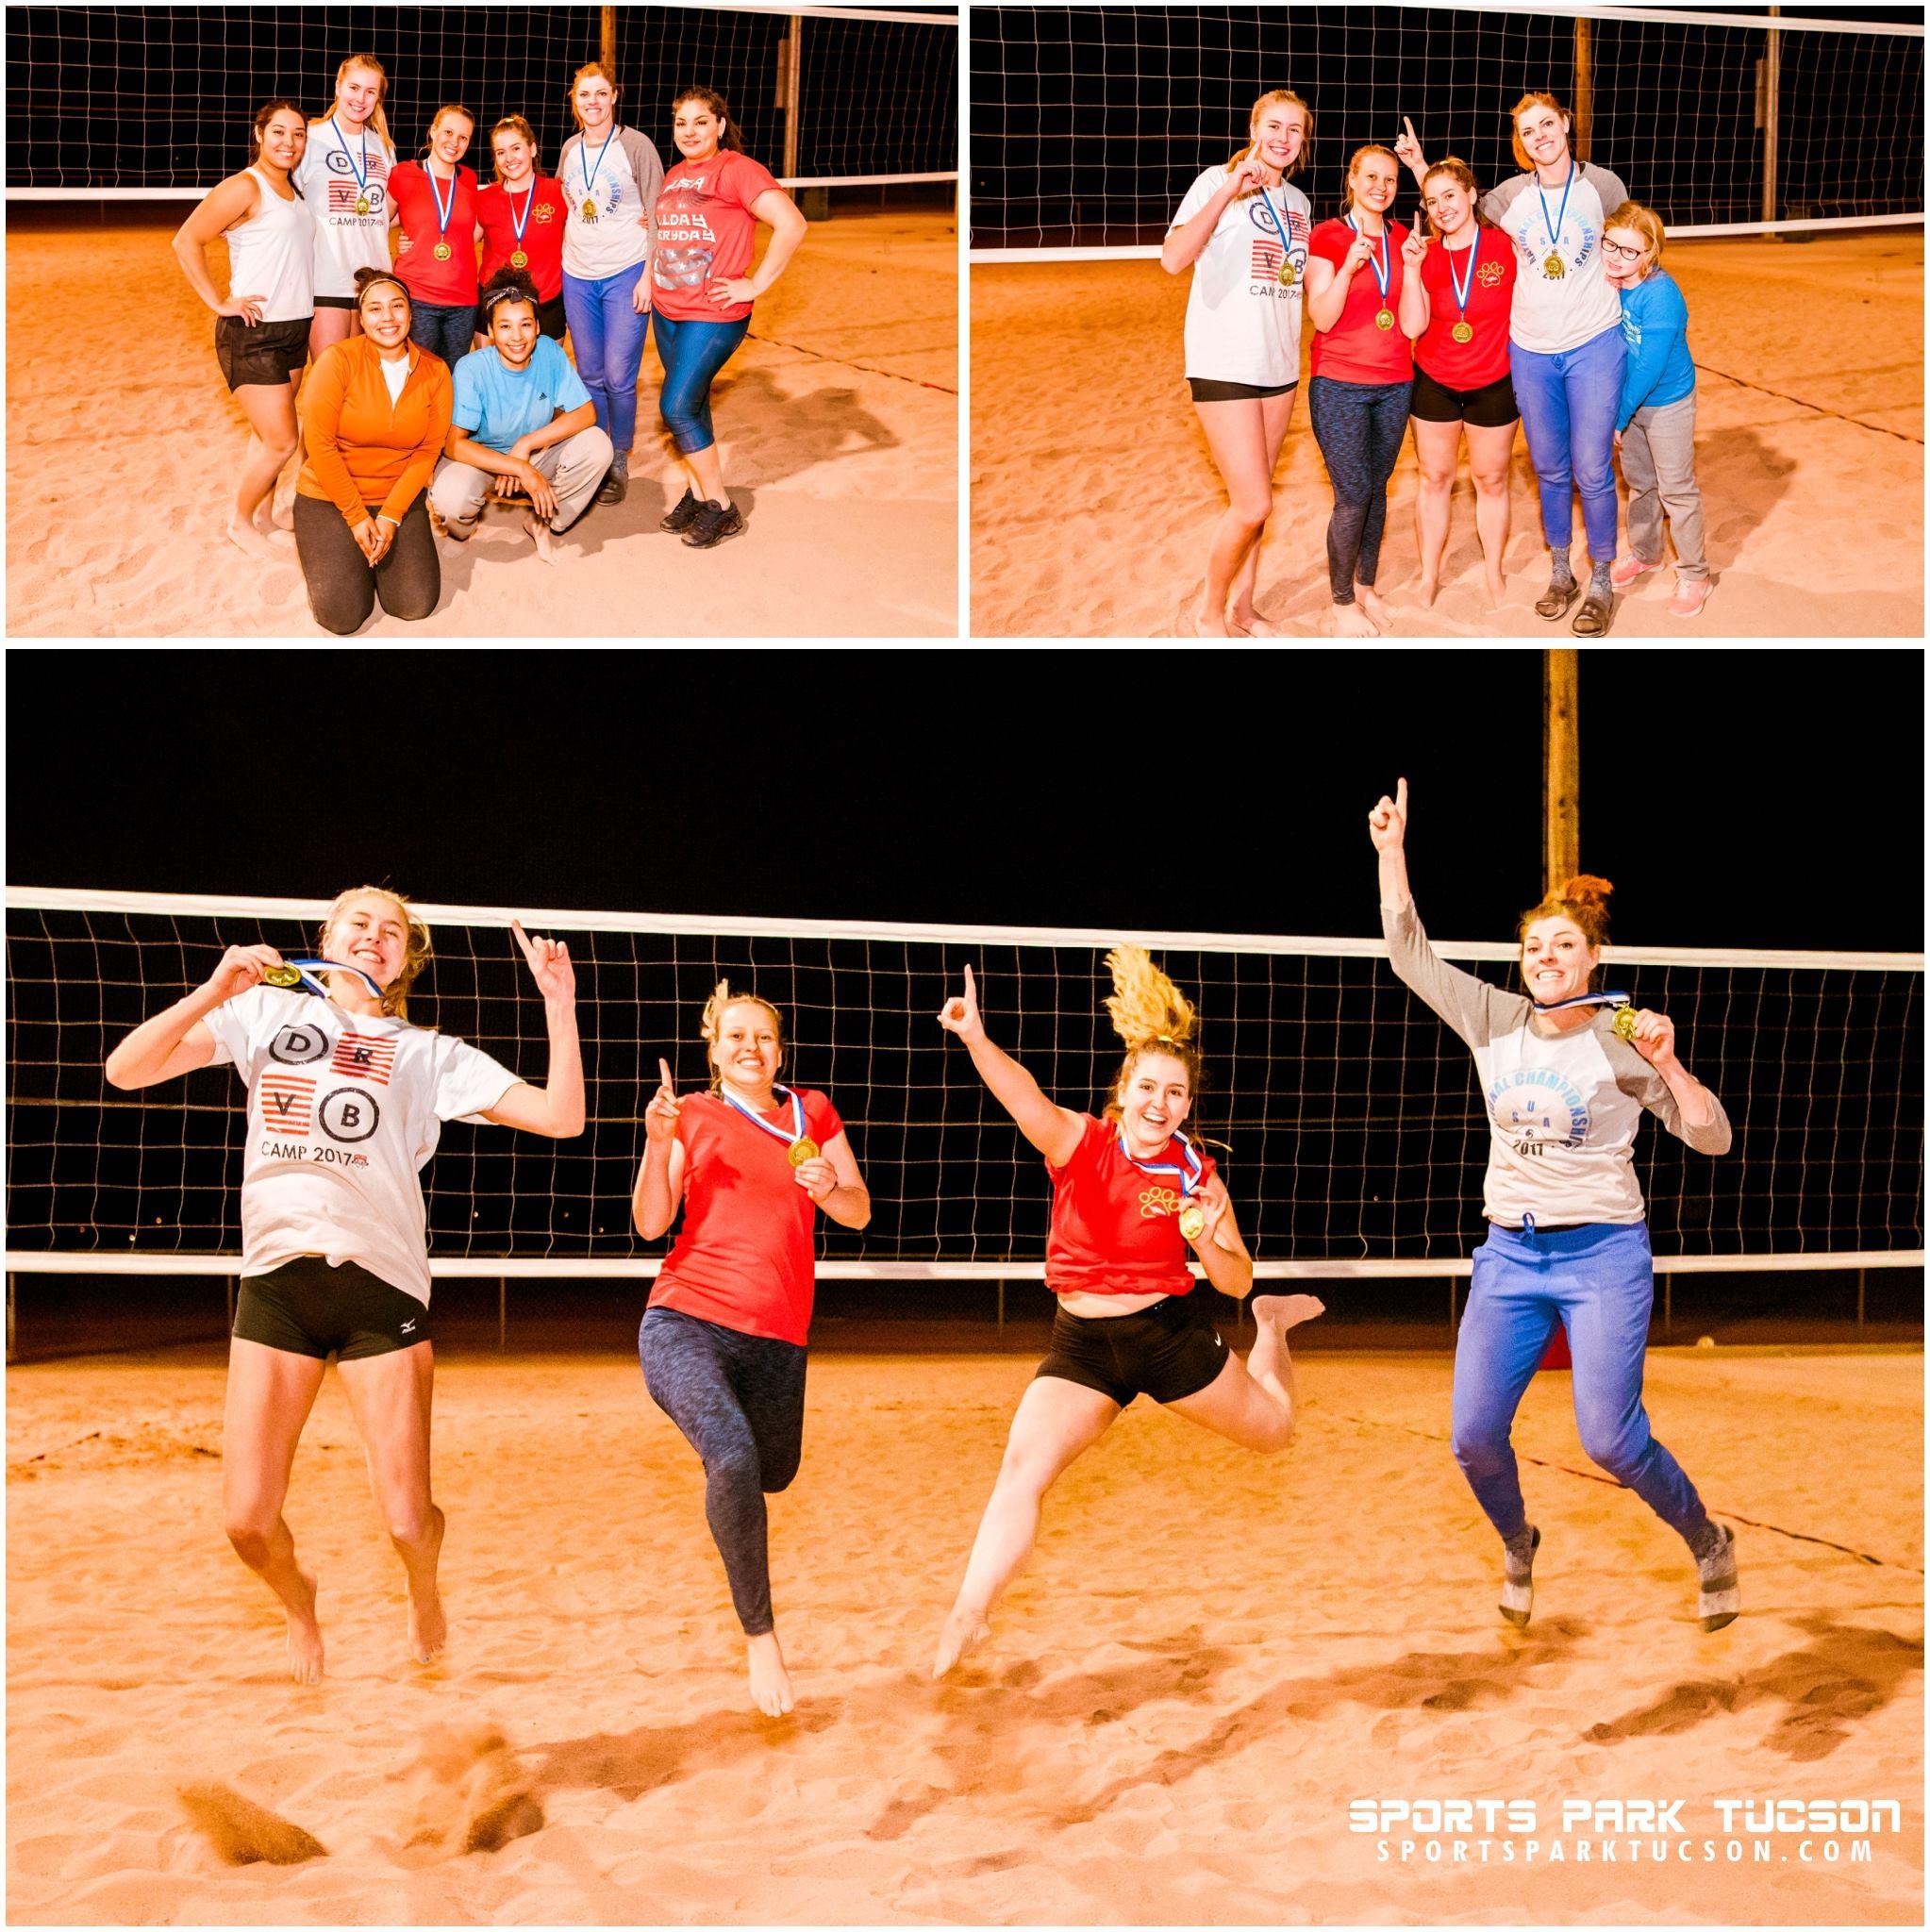 November 11th Volleyball Tournament (Women's) - 5PM Champions